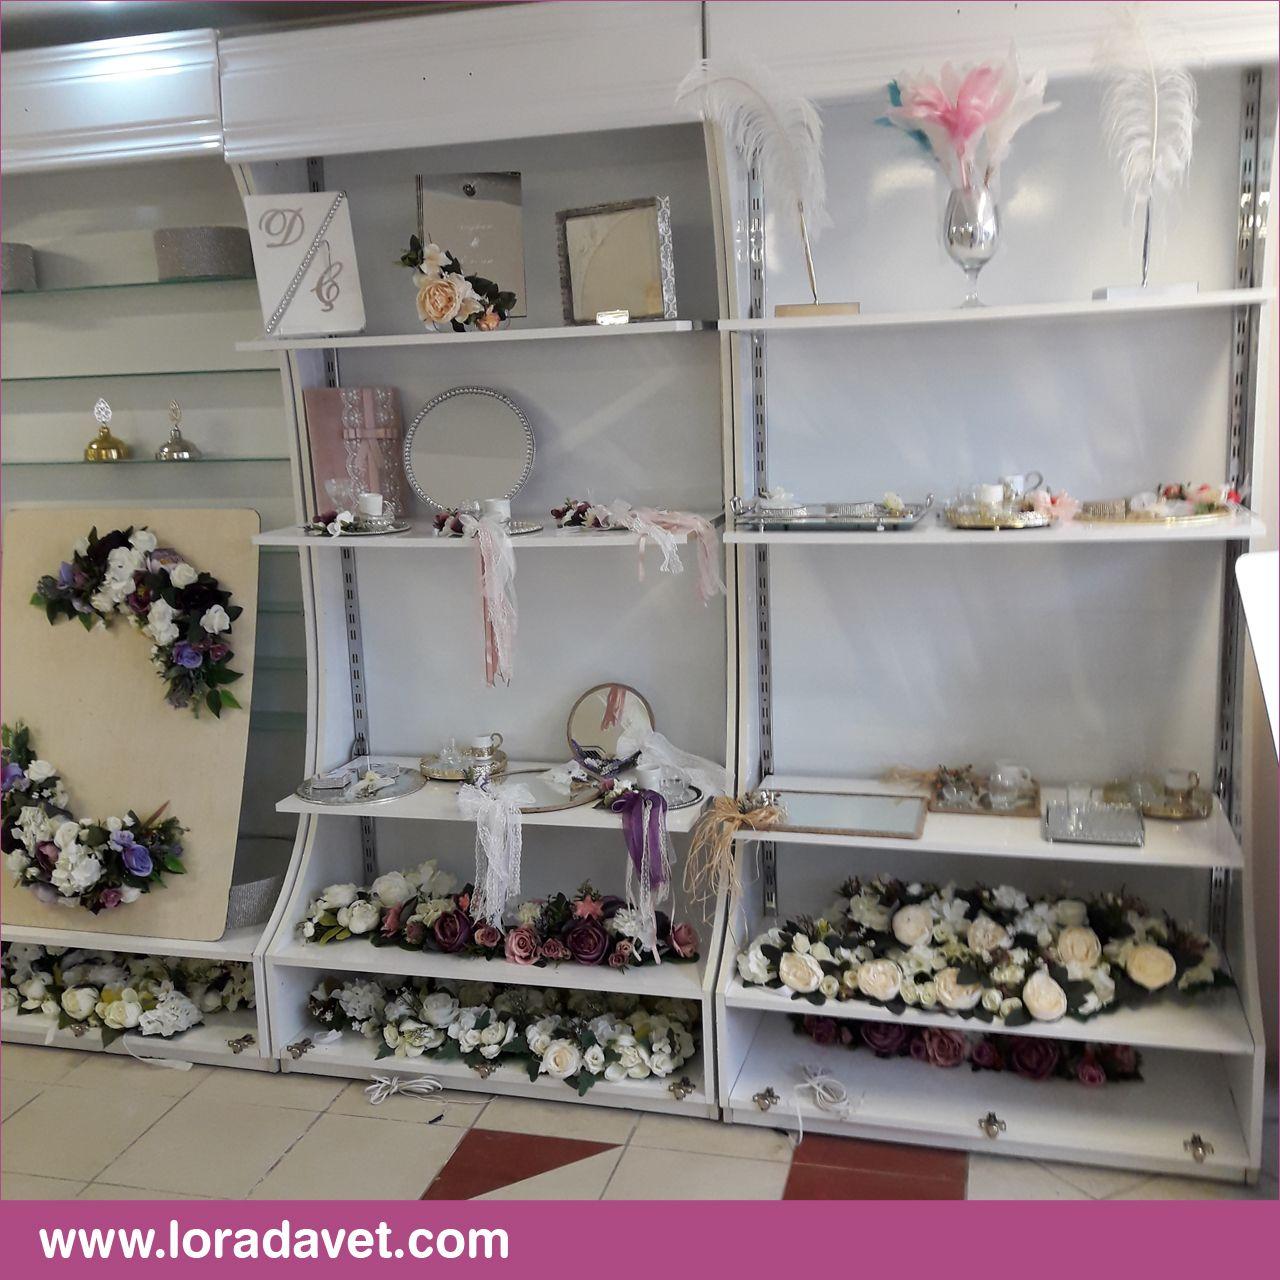 LORA DAVET AVCILAR - İstanbulLORA DAVET AVCILAR Mağazamız